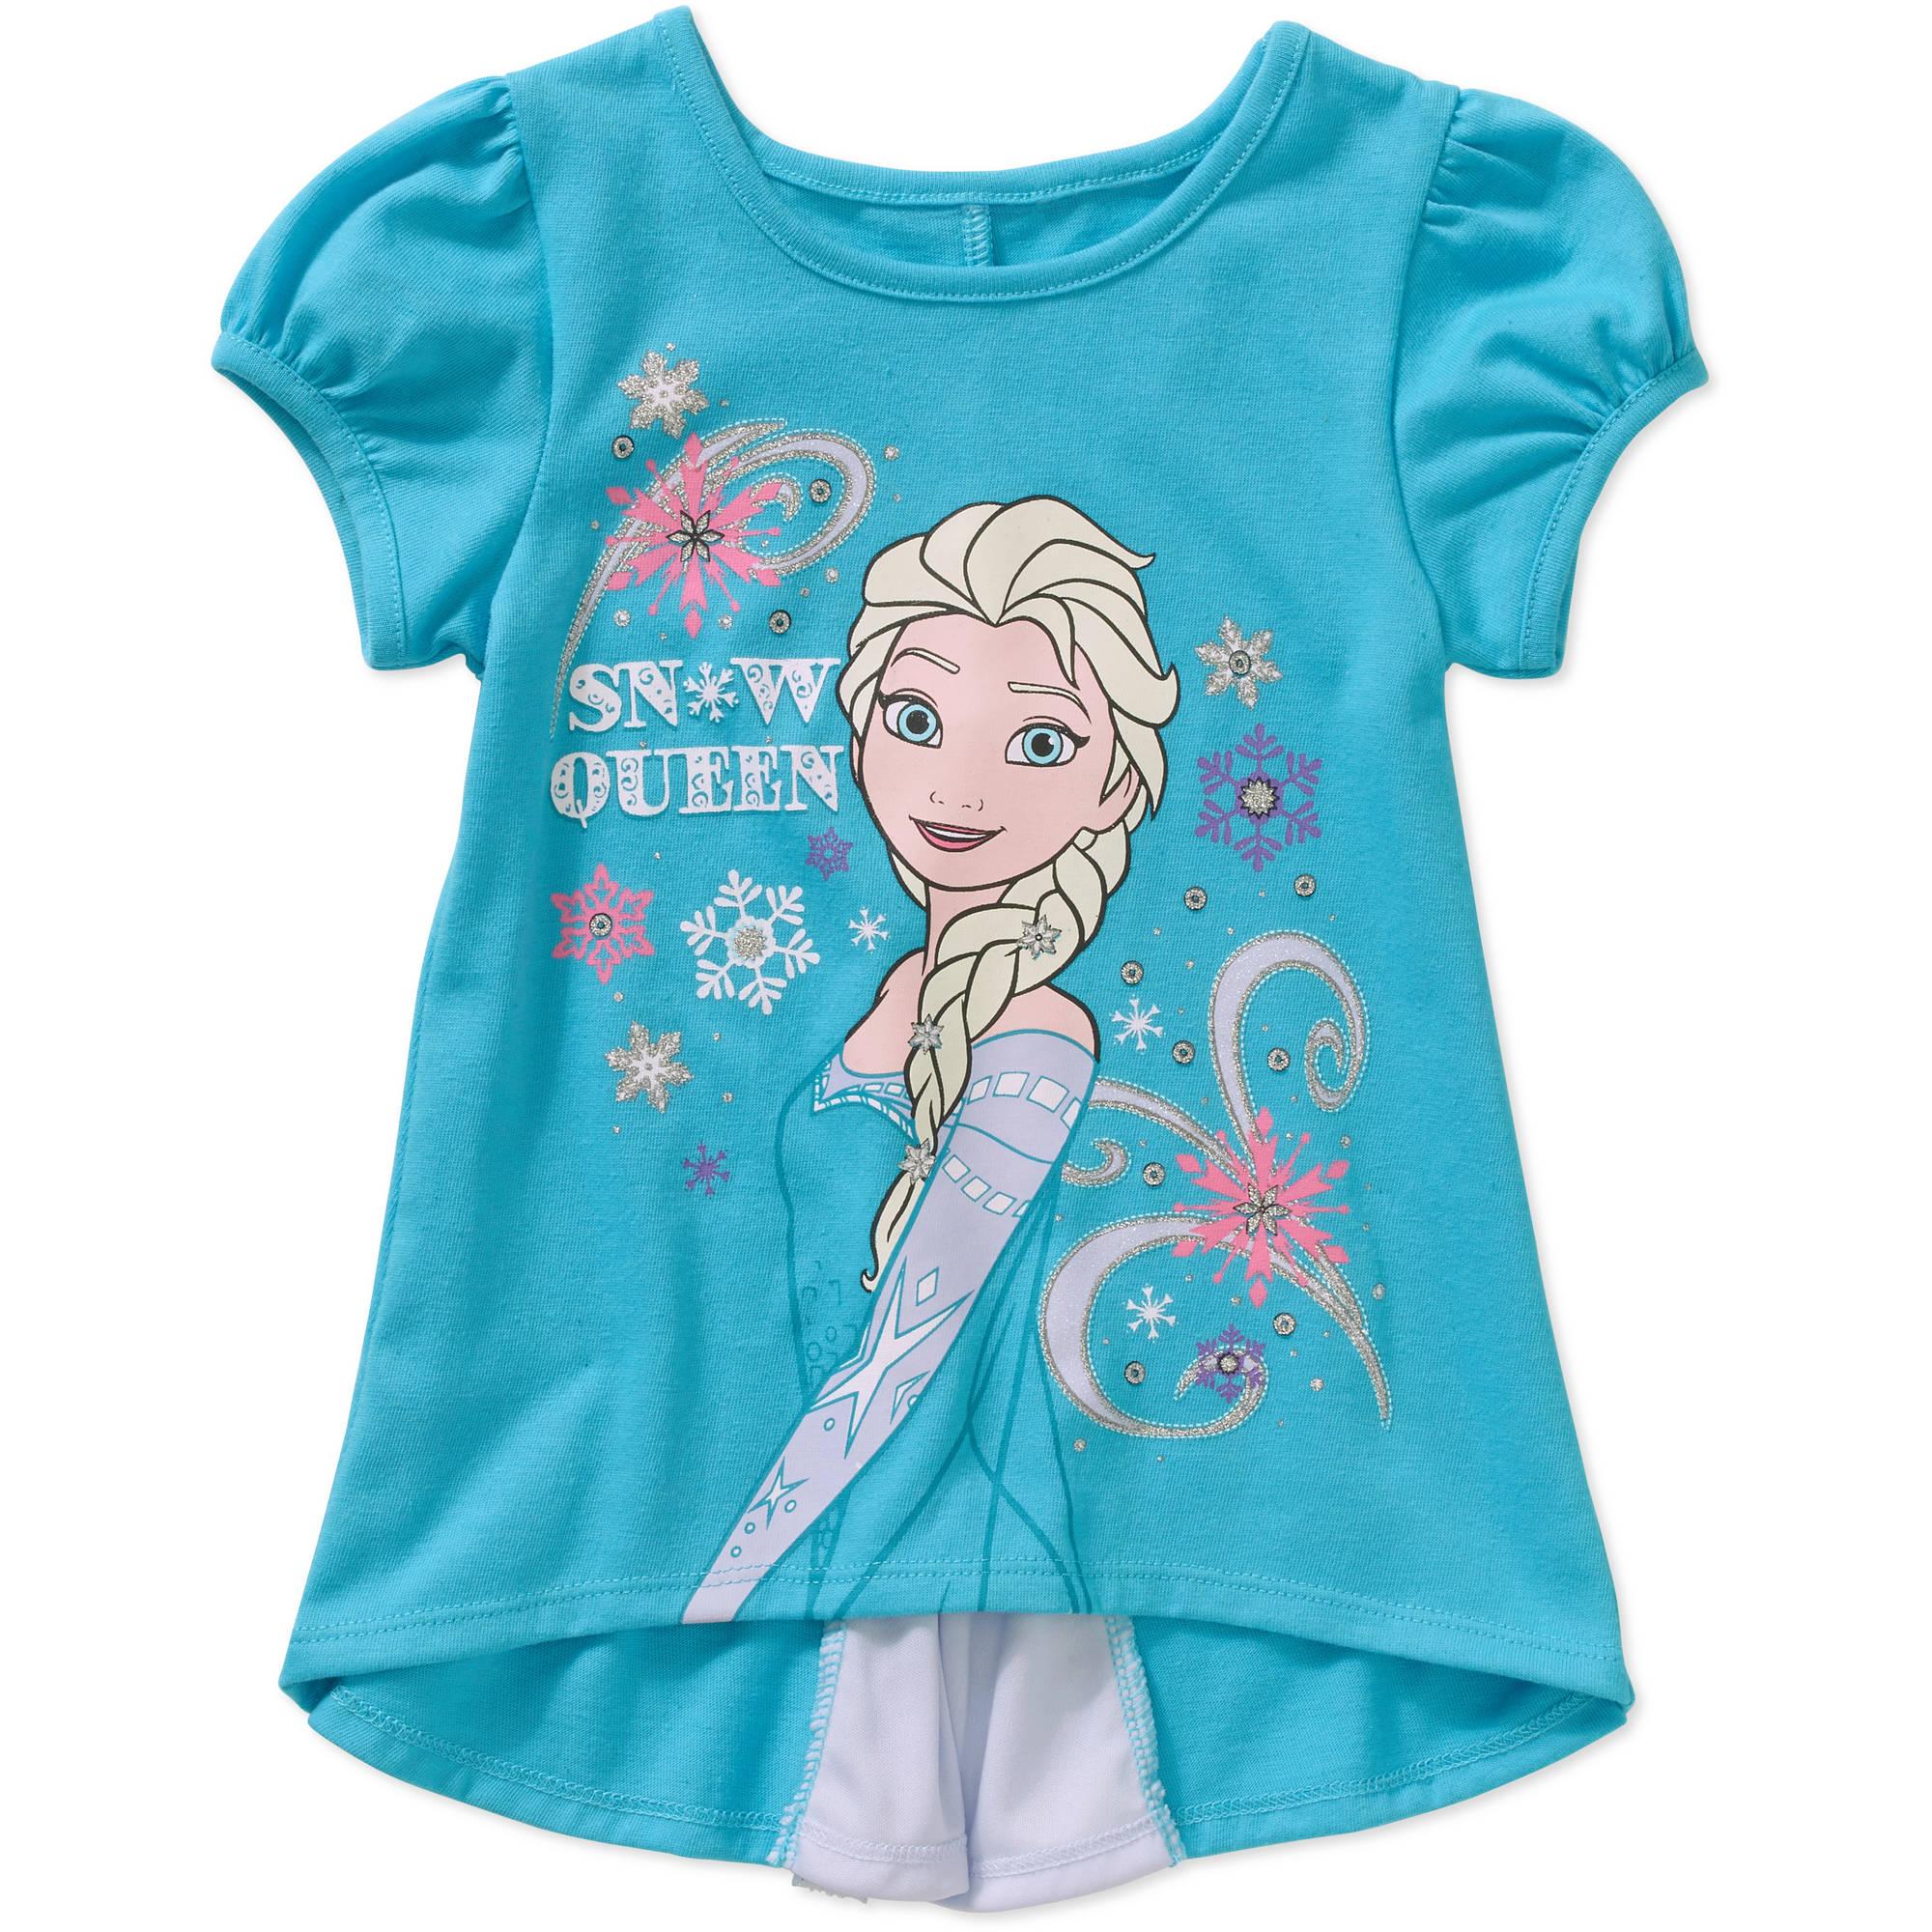 Disney Frozen Toddler Girl Bow Back Graphic Tee Shirt